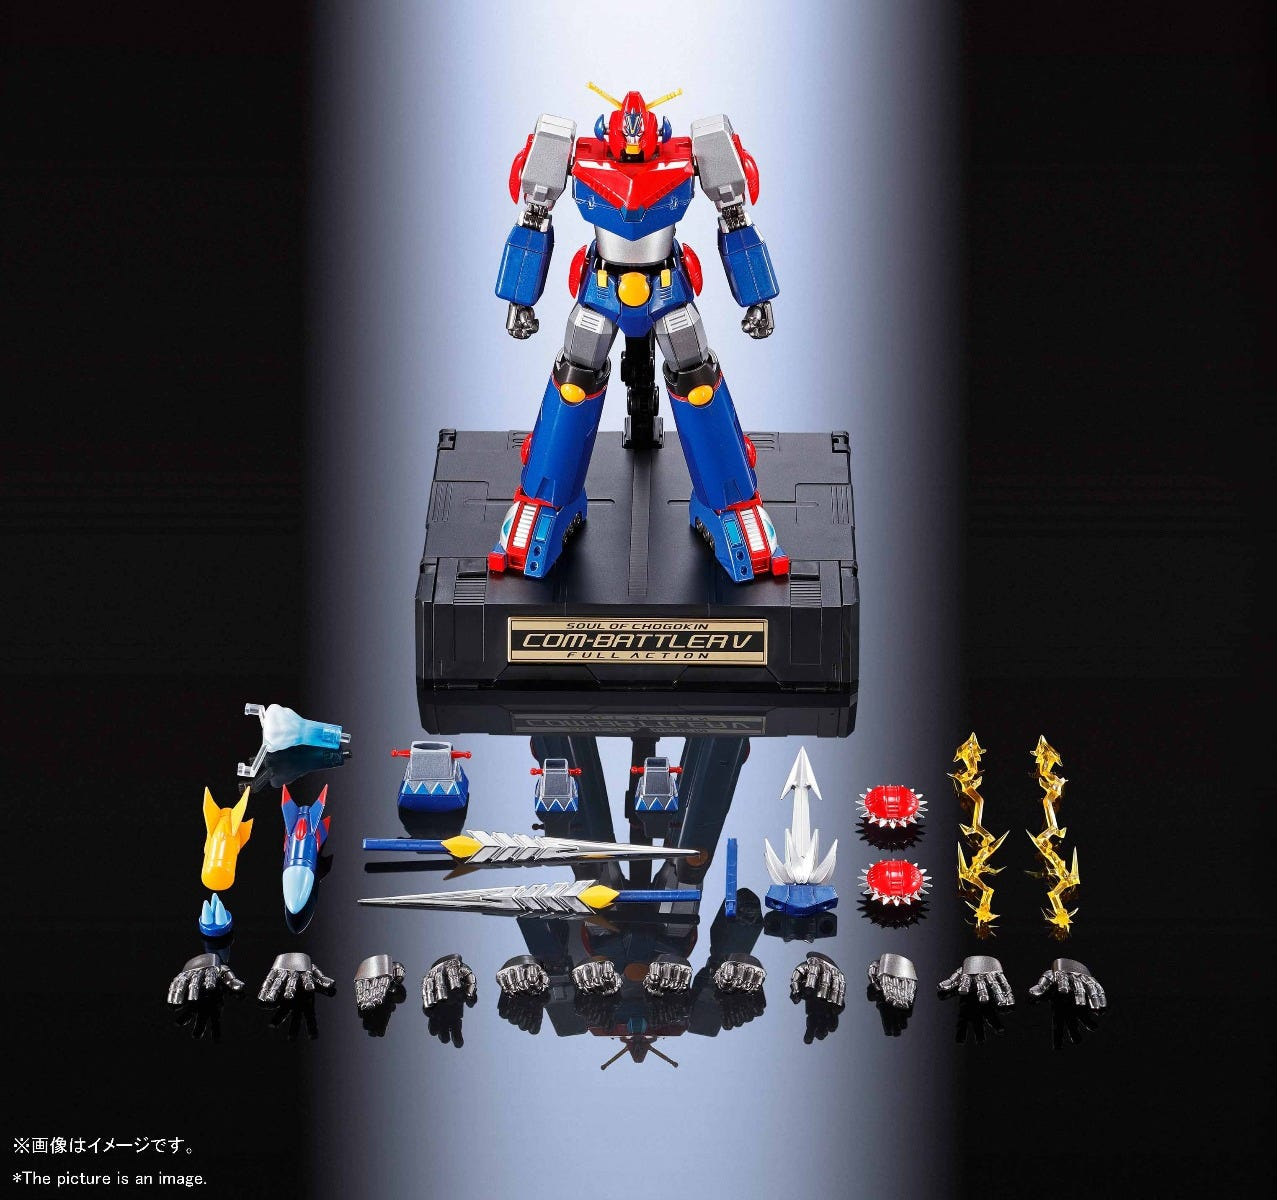 Bandai GX-90 Super Electromagnetic COM-BATTLER V FA, Bandai Soul of Chogokin